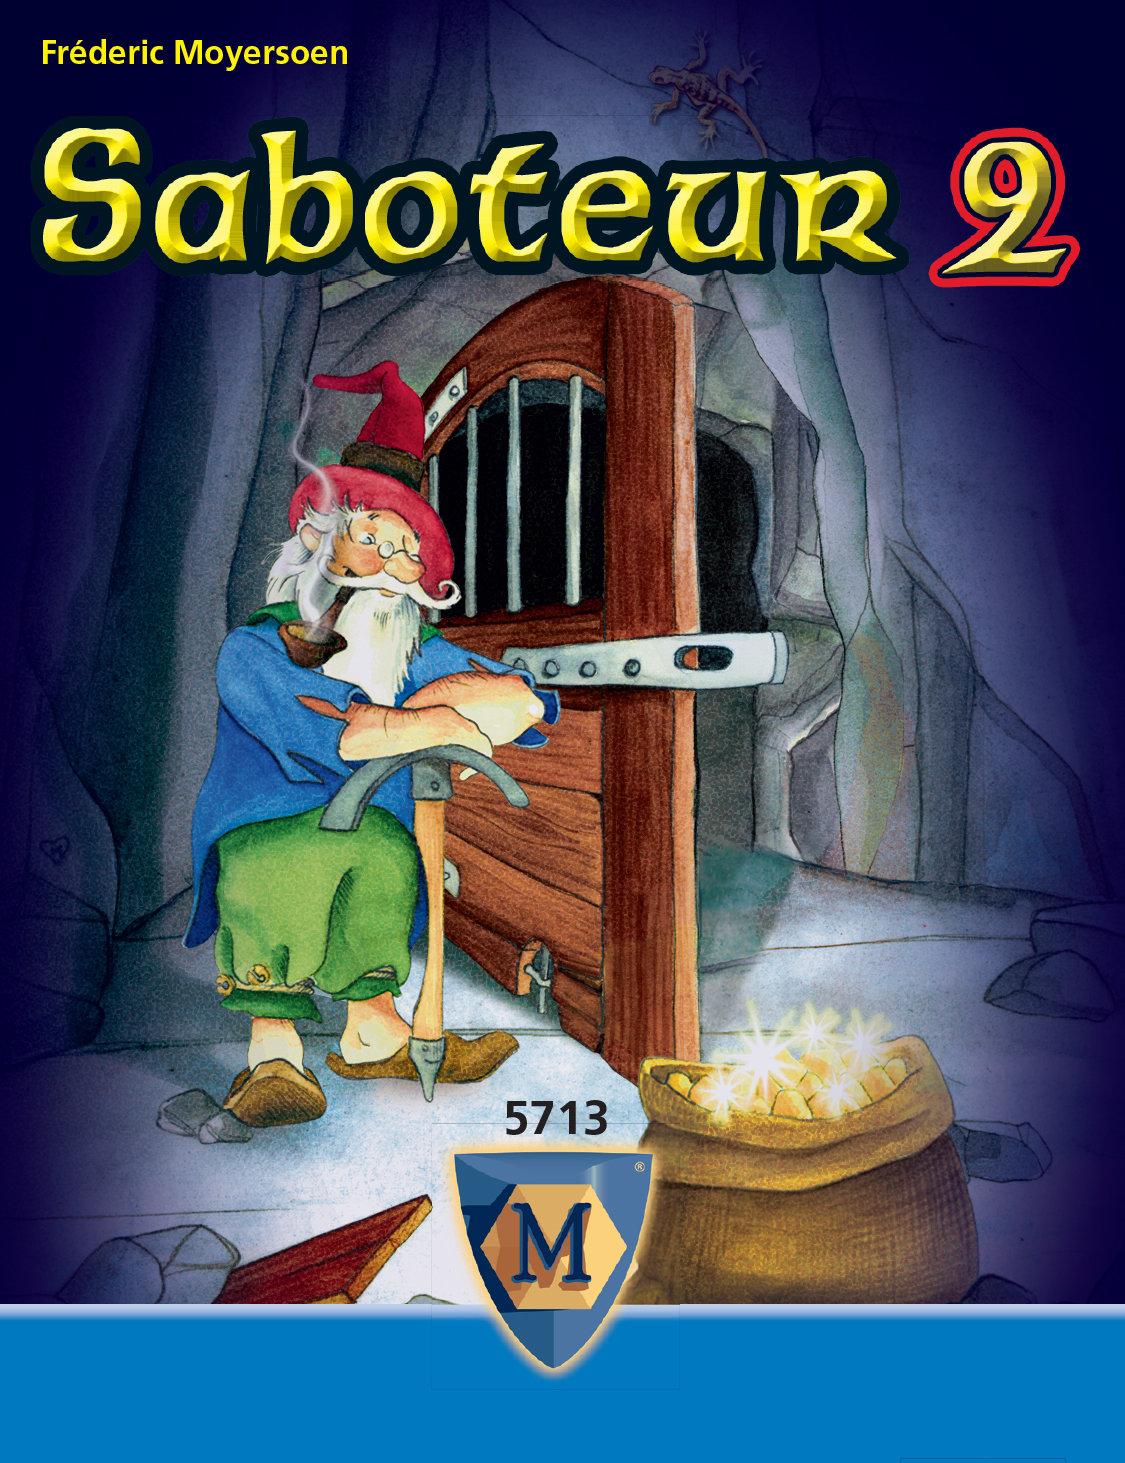 Saboteur 2 (Expansion Only)